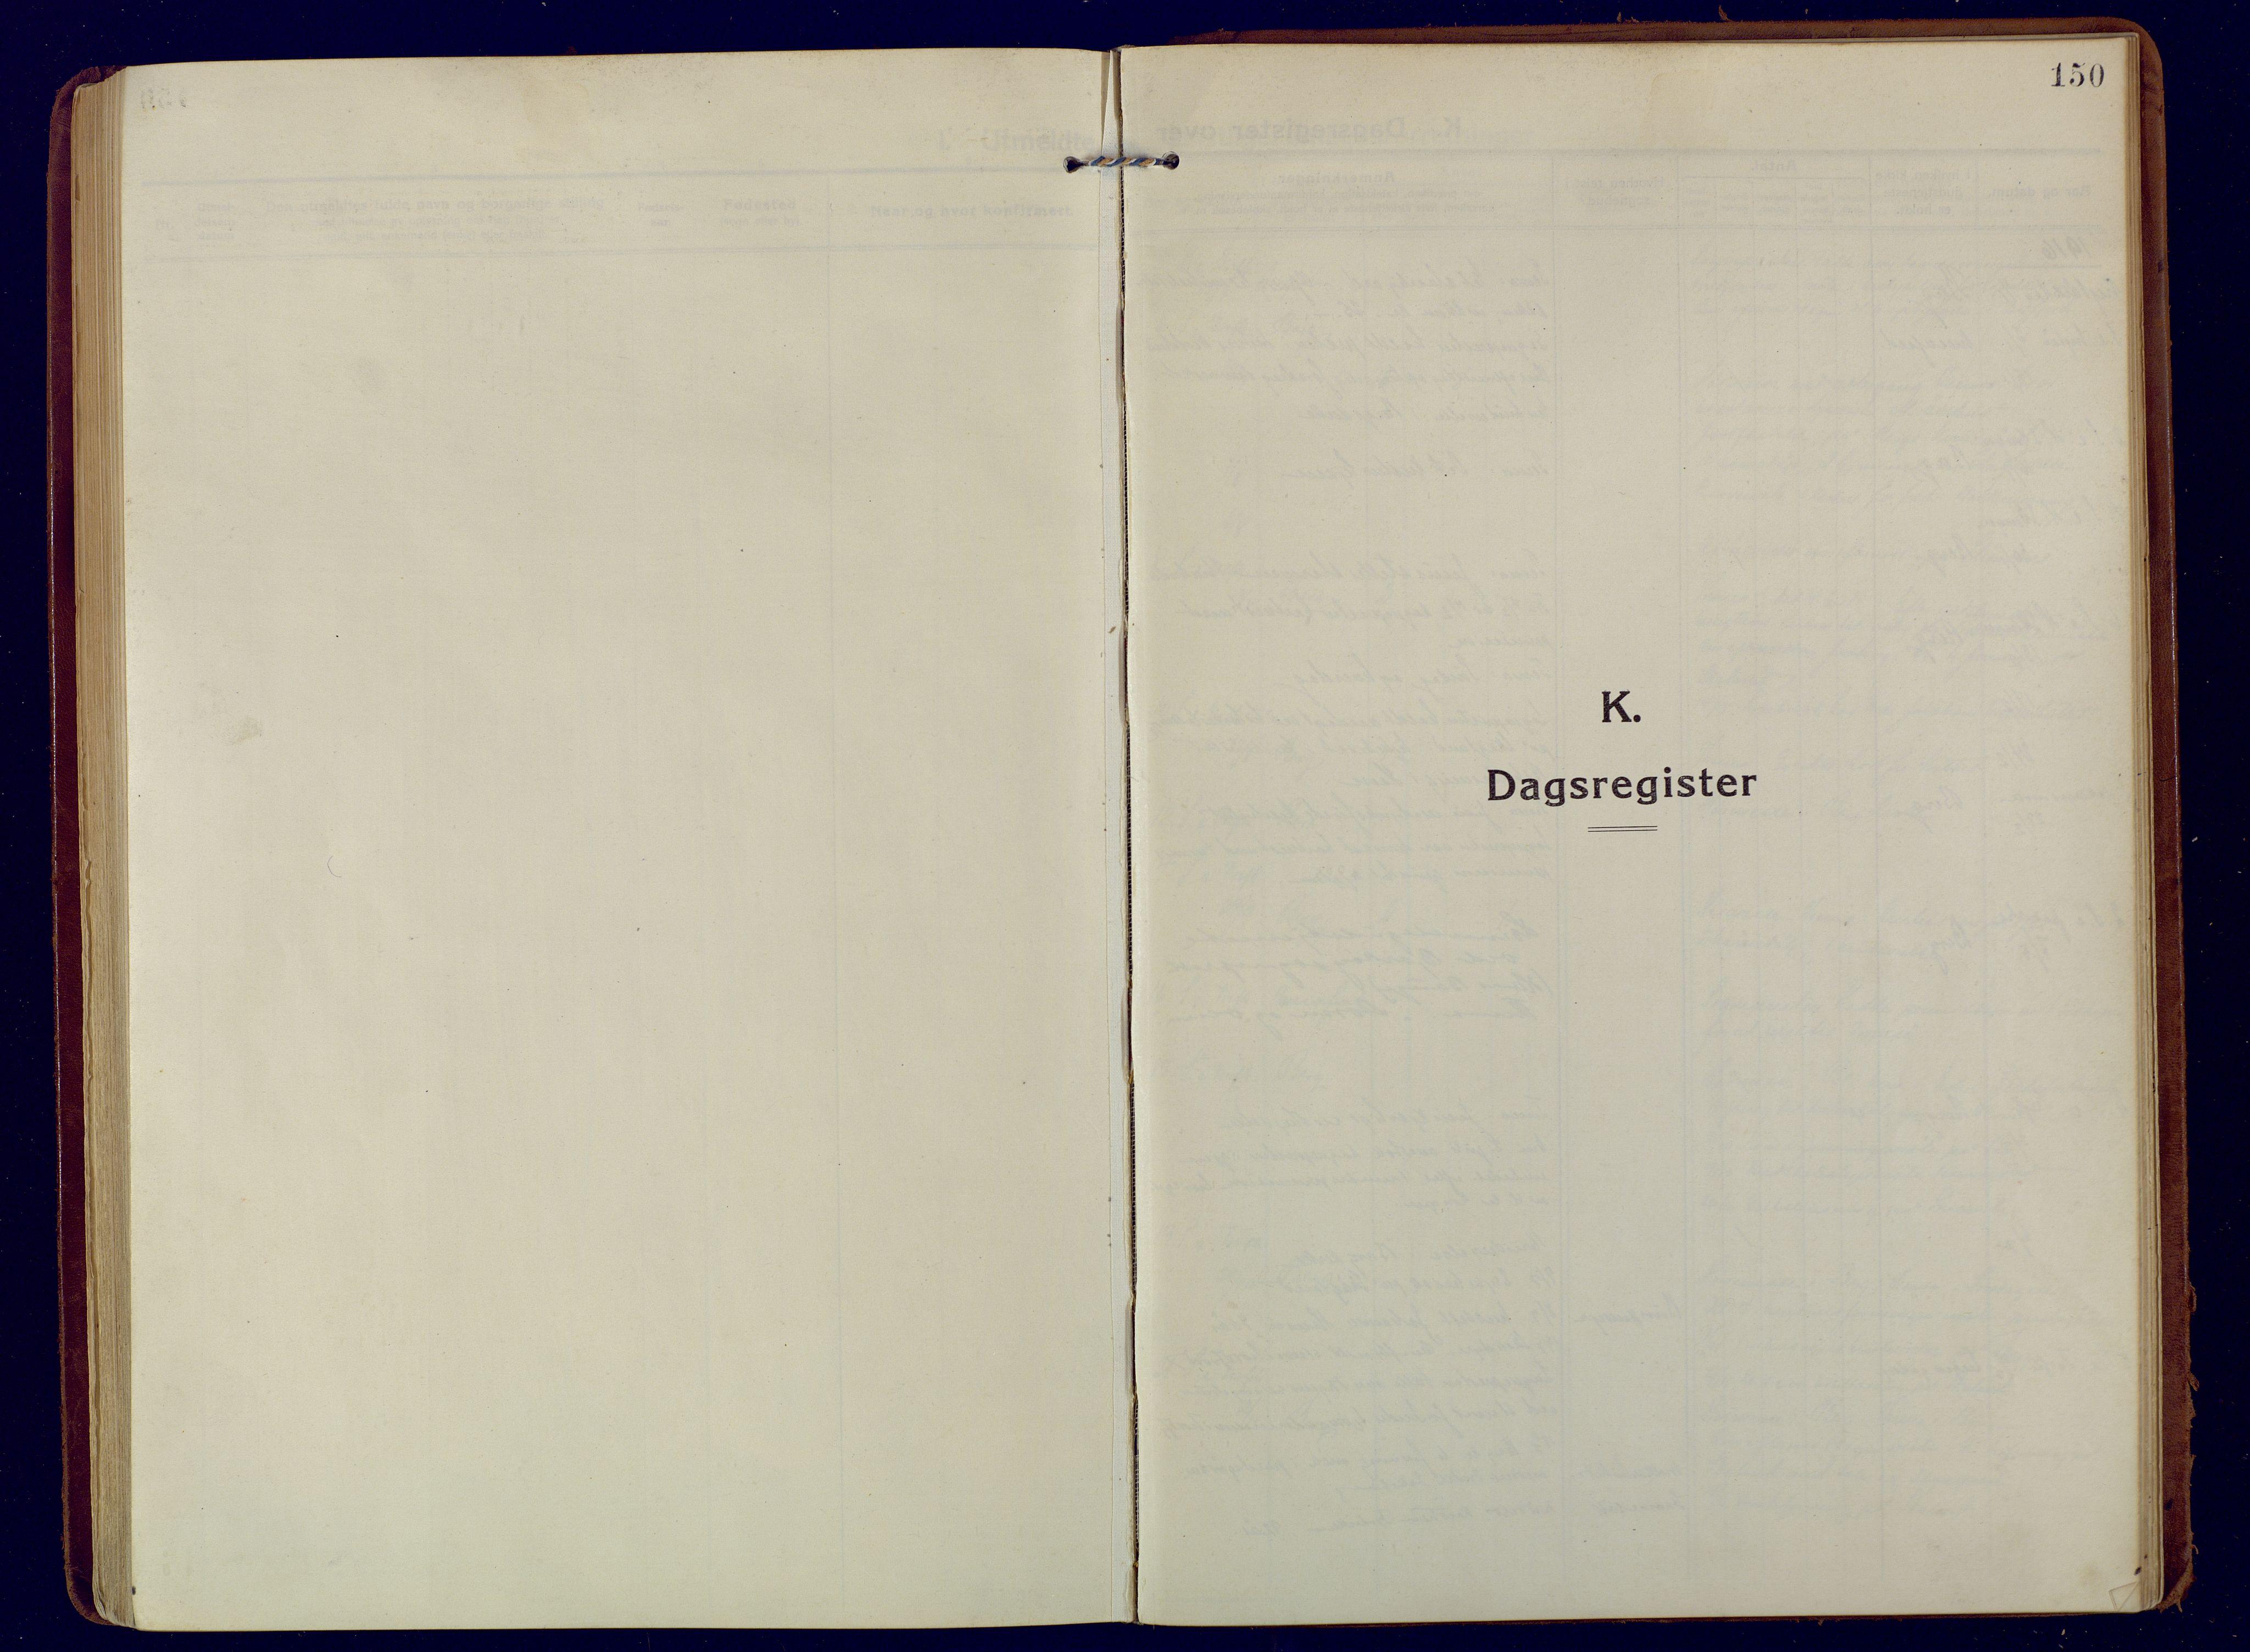 SATØ, Mefjord/Berg sokneprestkontor, G/Ga/Gaa: Ministerialbok nr. 9, 1916-1928, s. 150